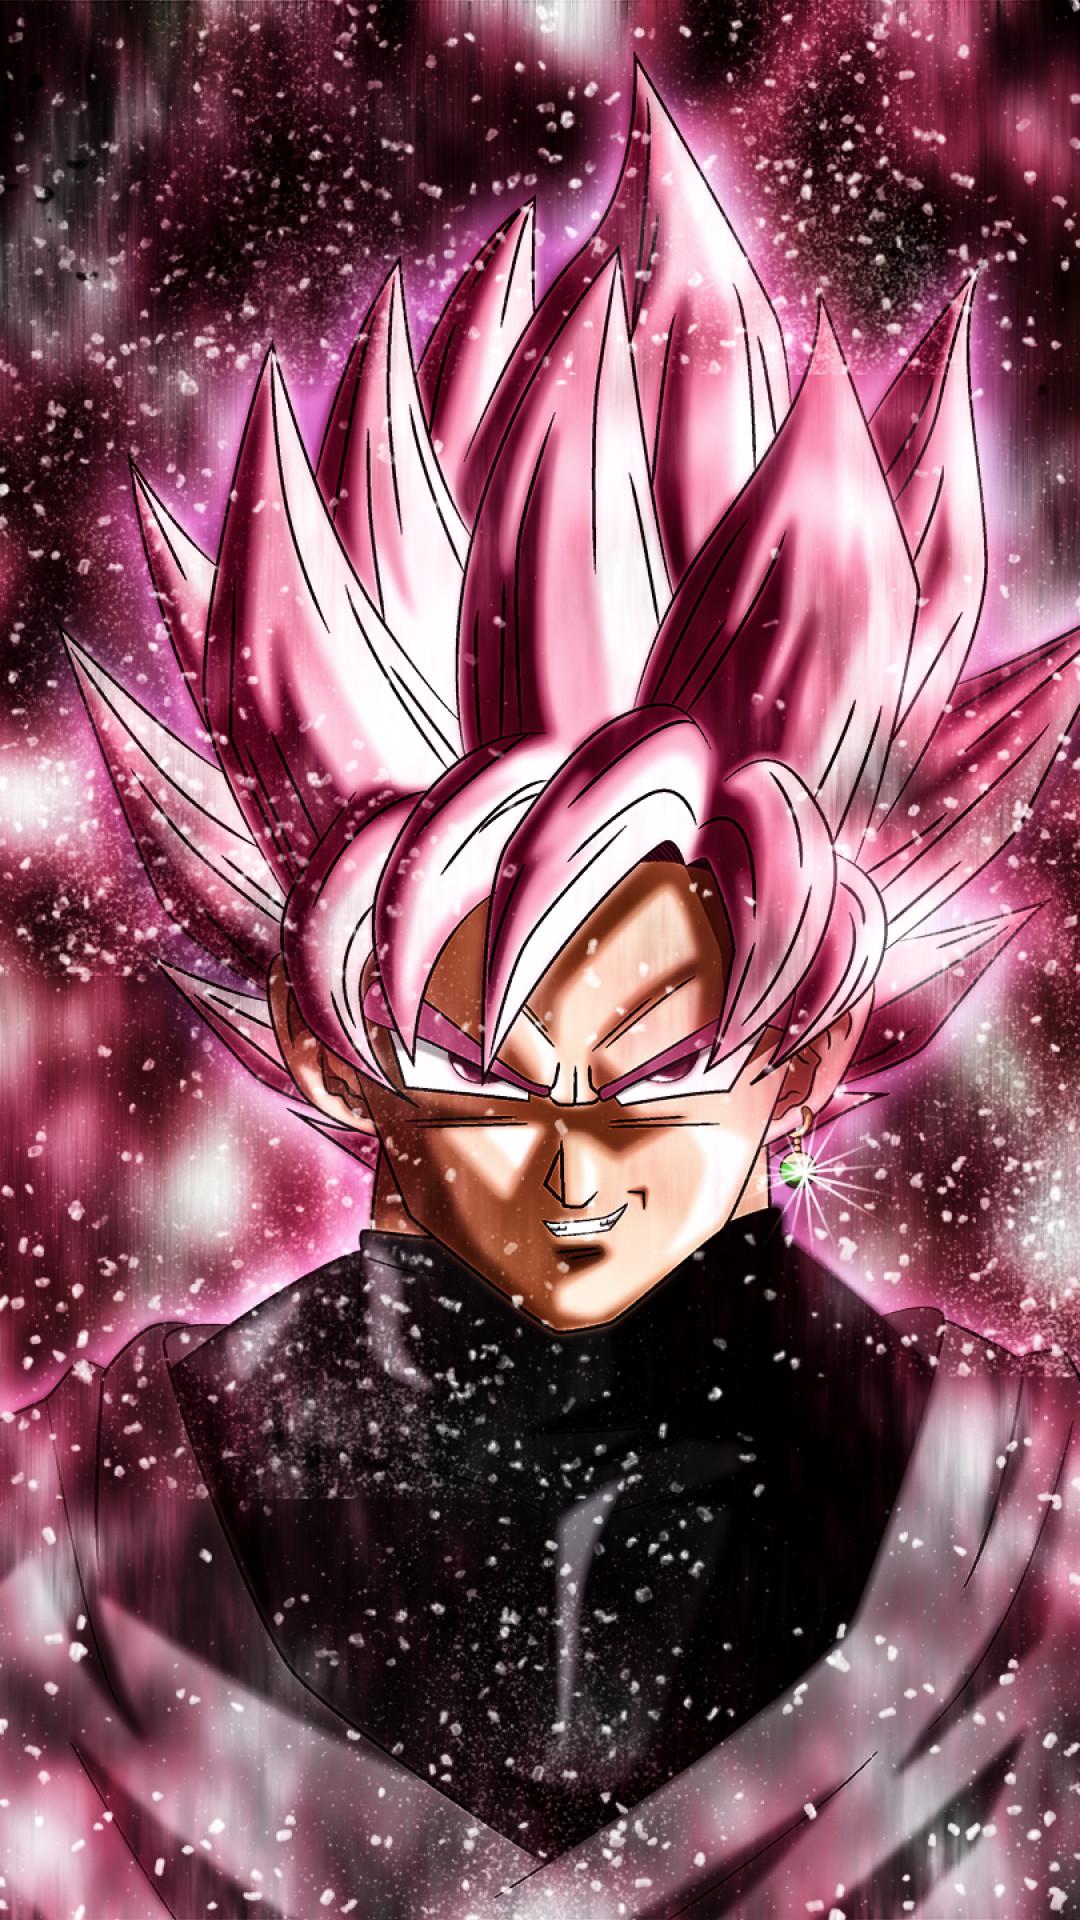 Black Goku, Transform, Dragon Ball